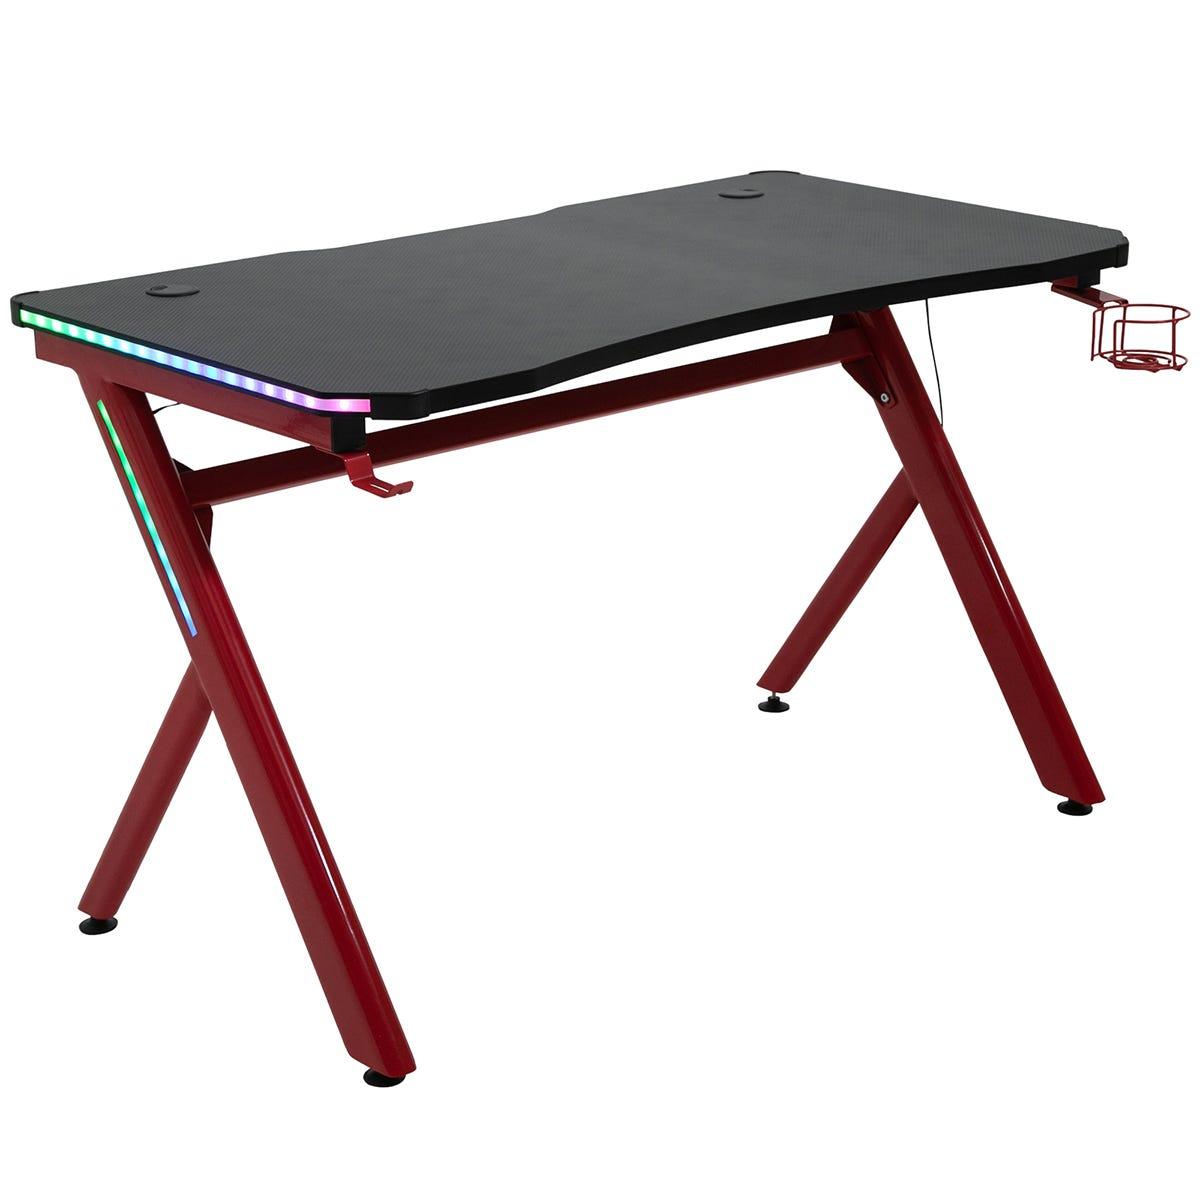 Equinox Blaze Gaming Desk with LED Strip - Black Tabletop/Red Frame